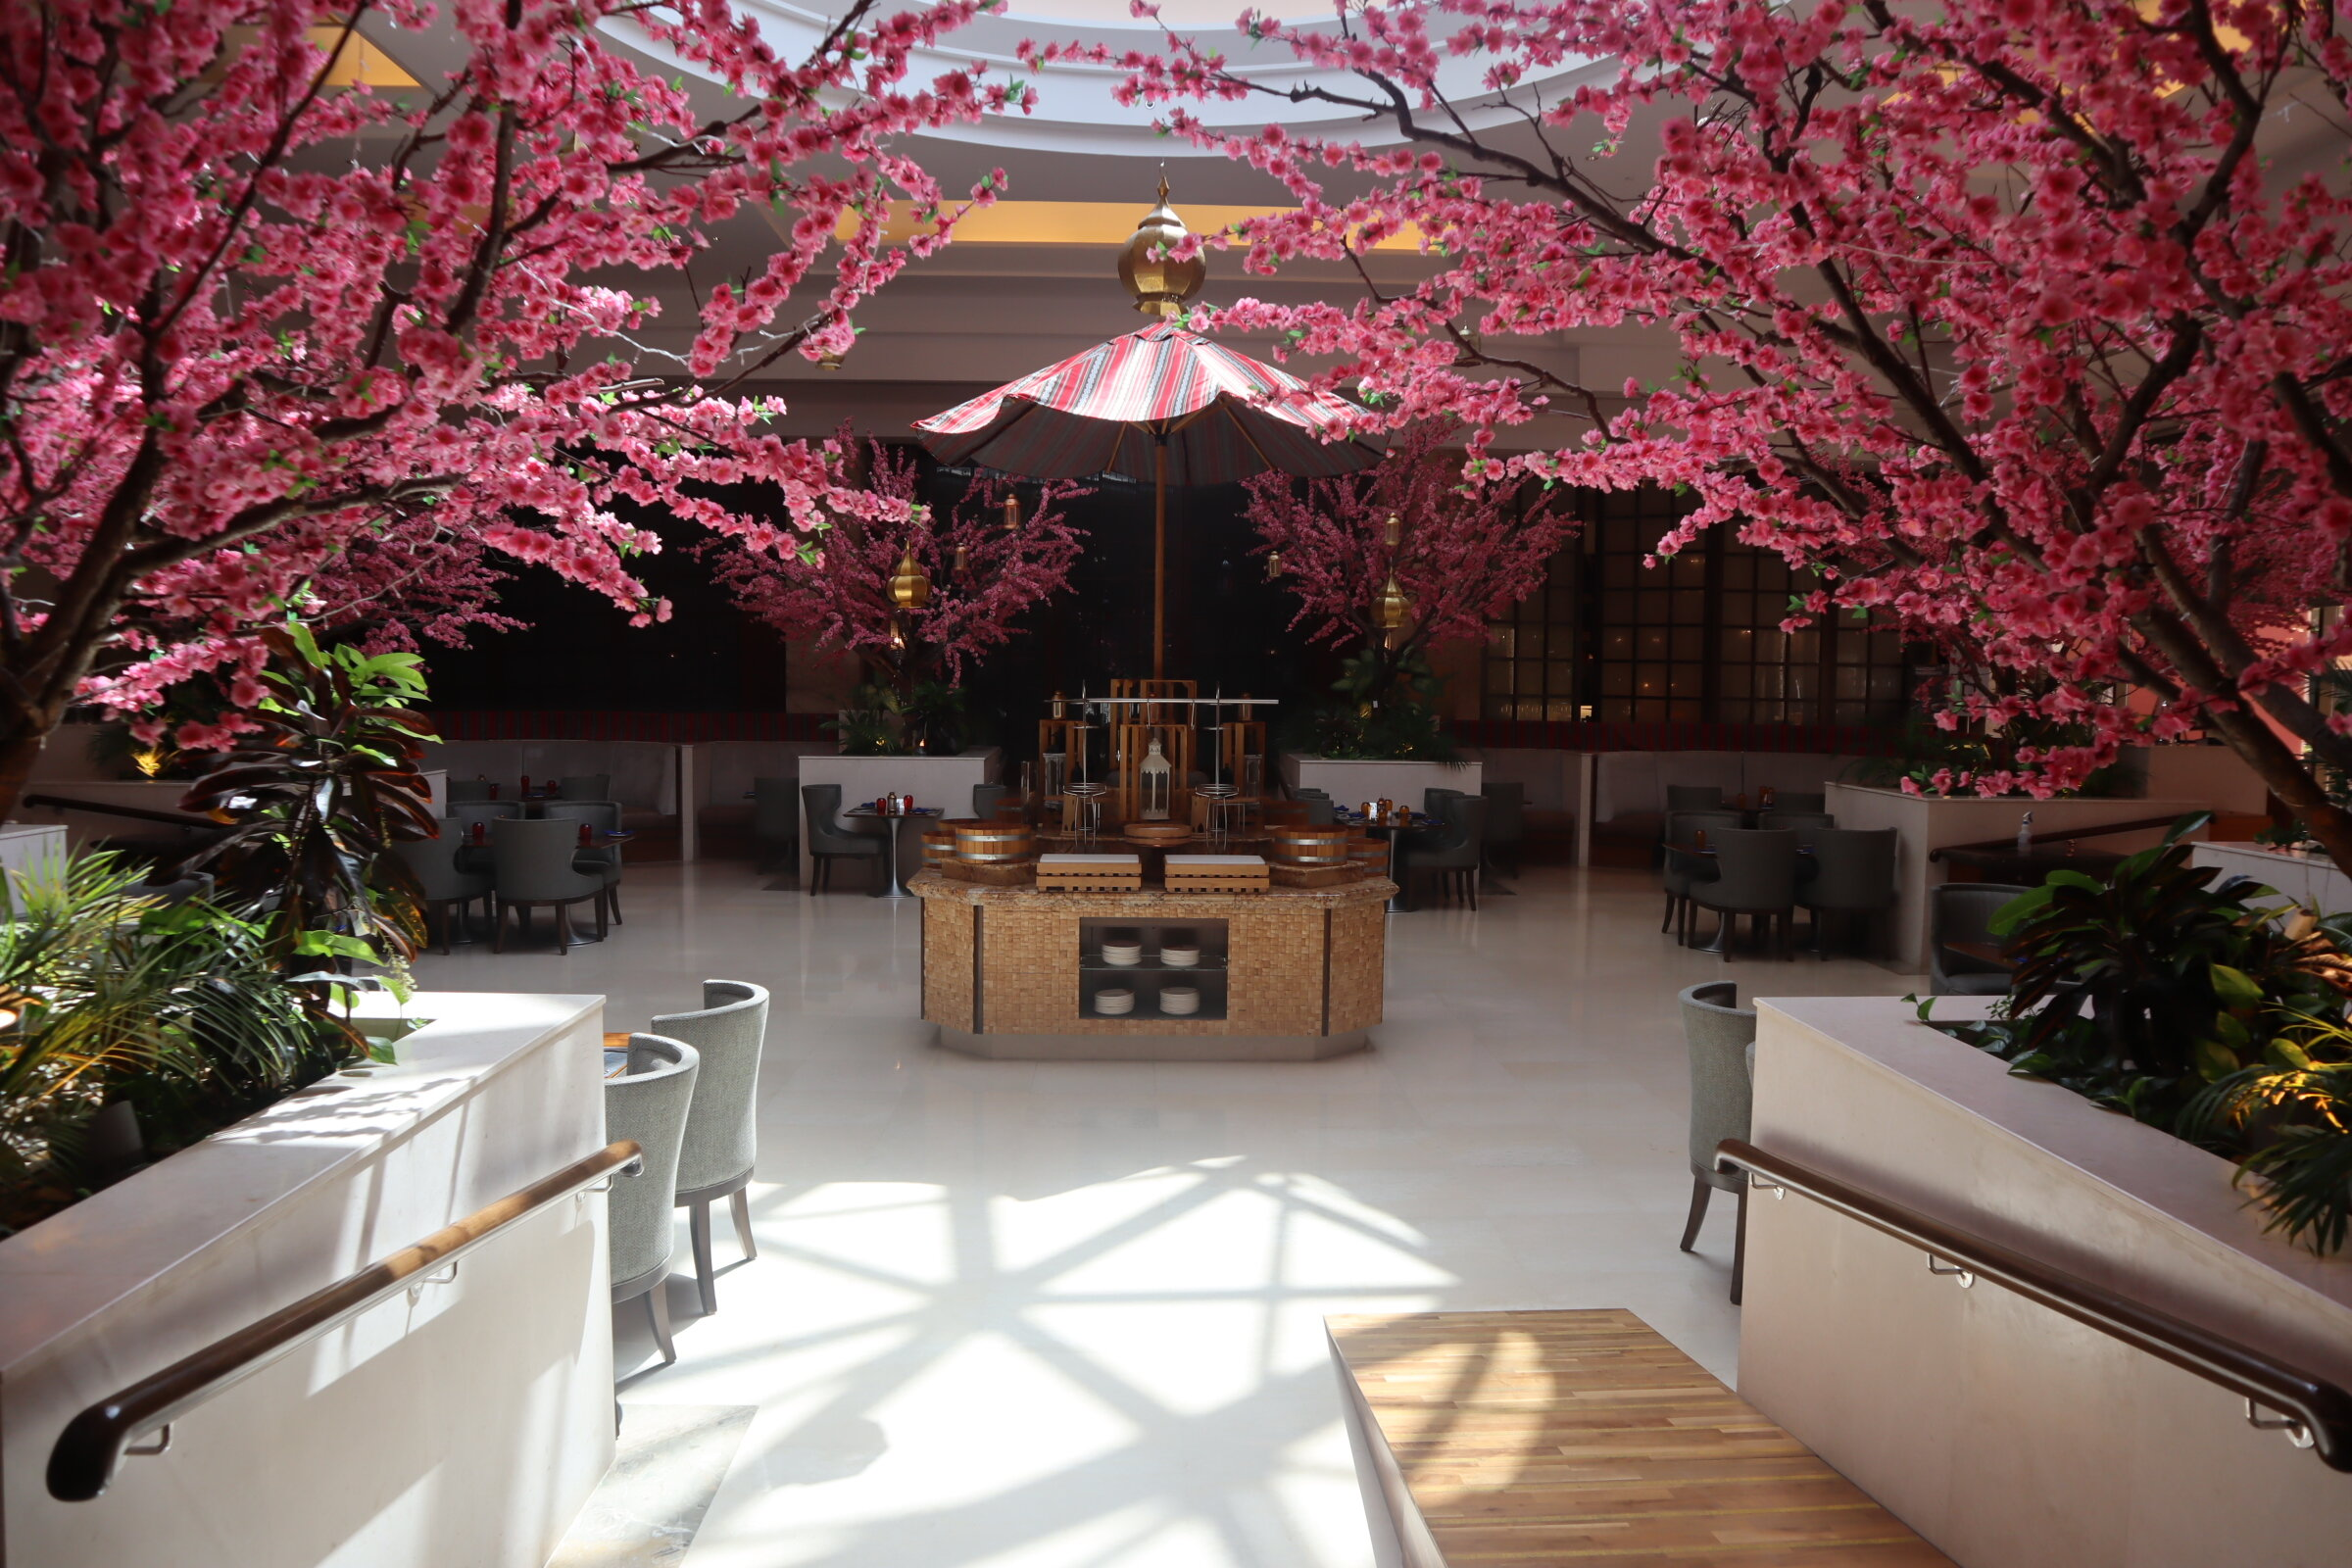 Sheraton Oman – Courtyard